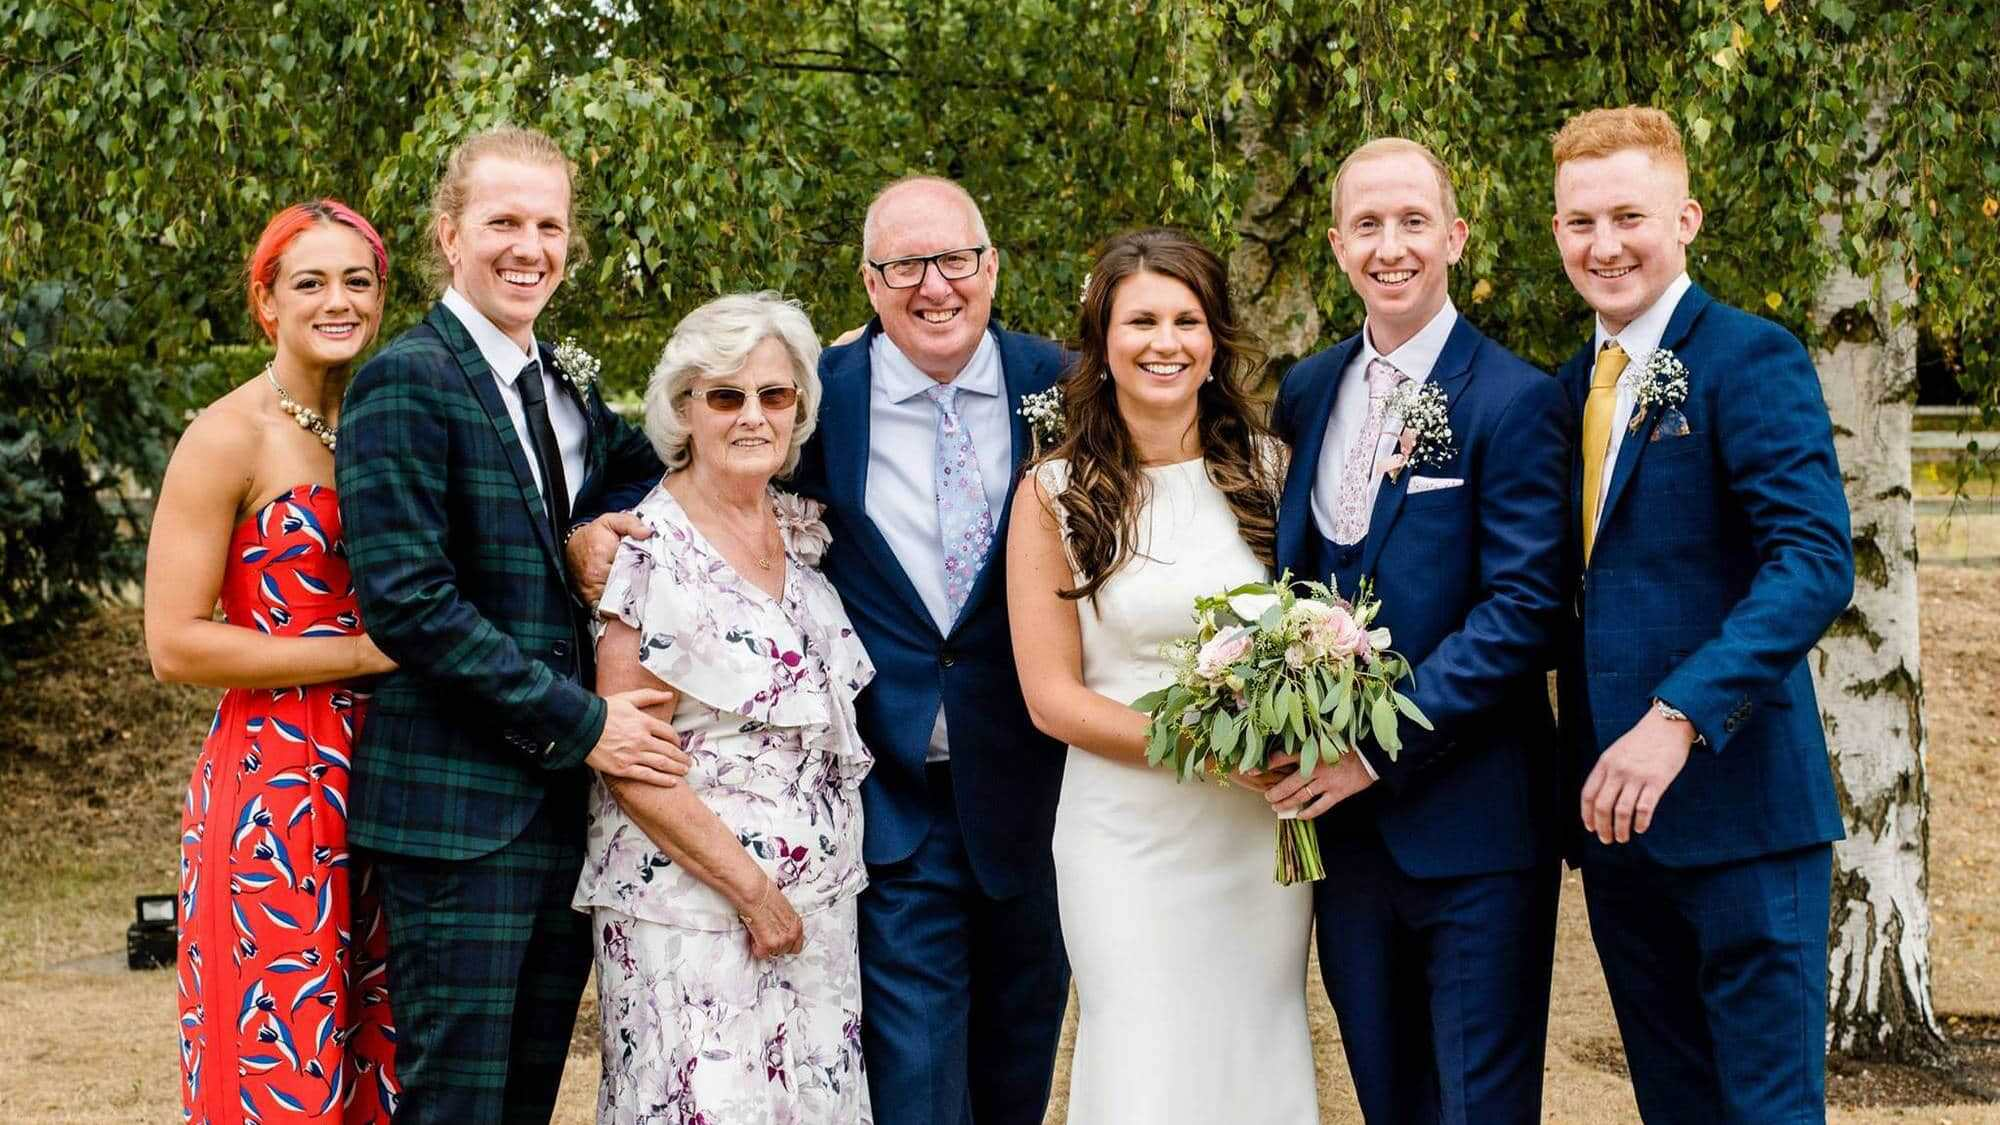 mark-seymour-wedding-photographer-bio 2